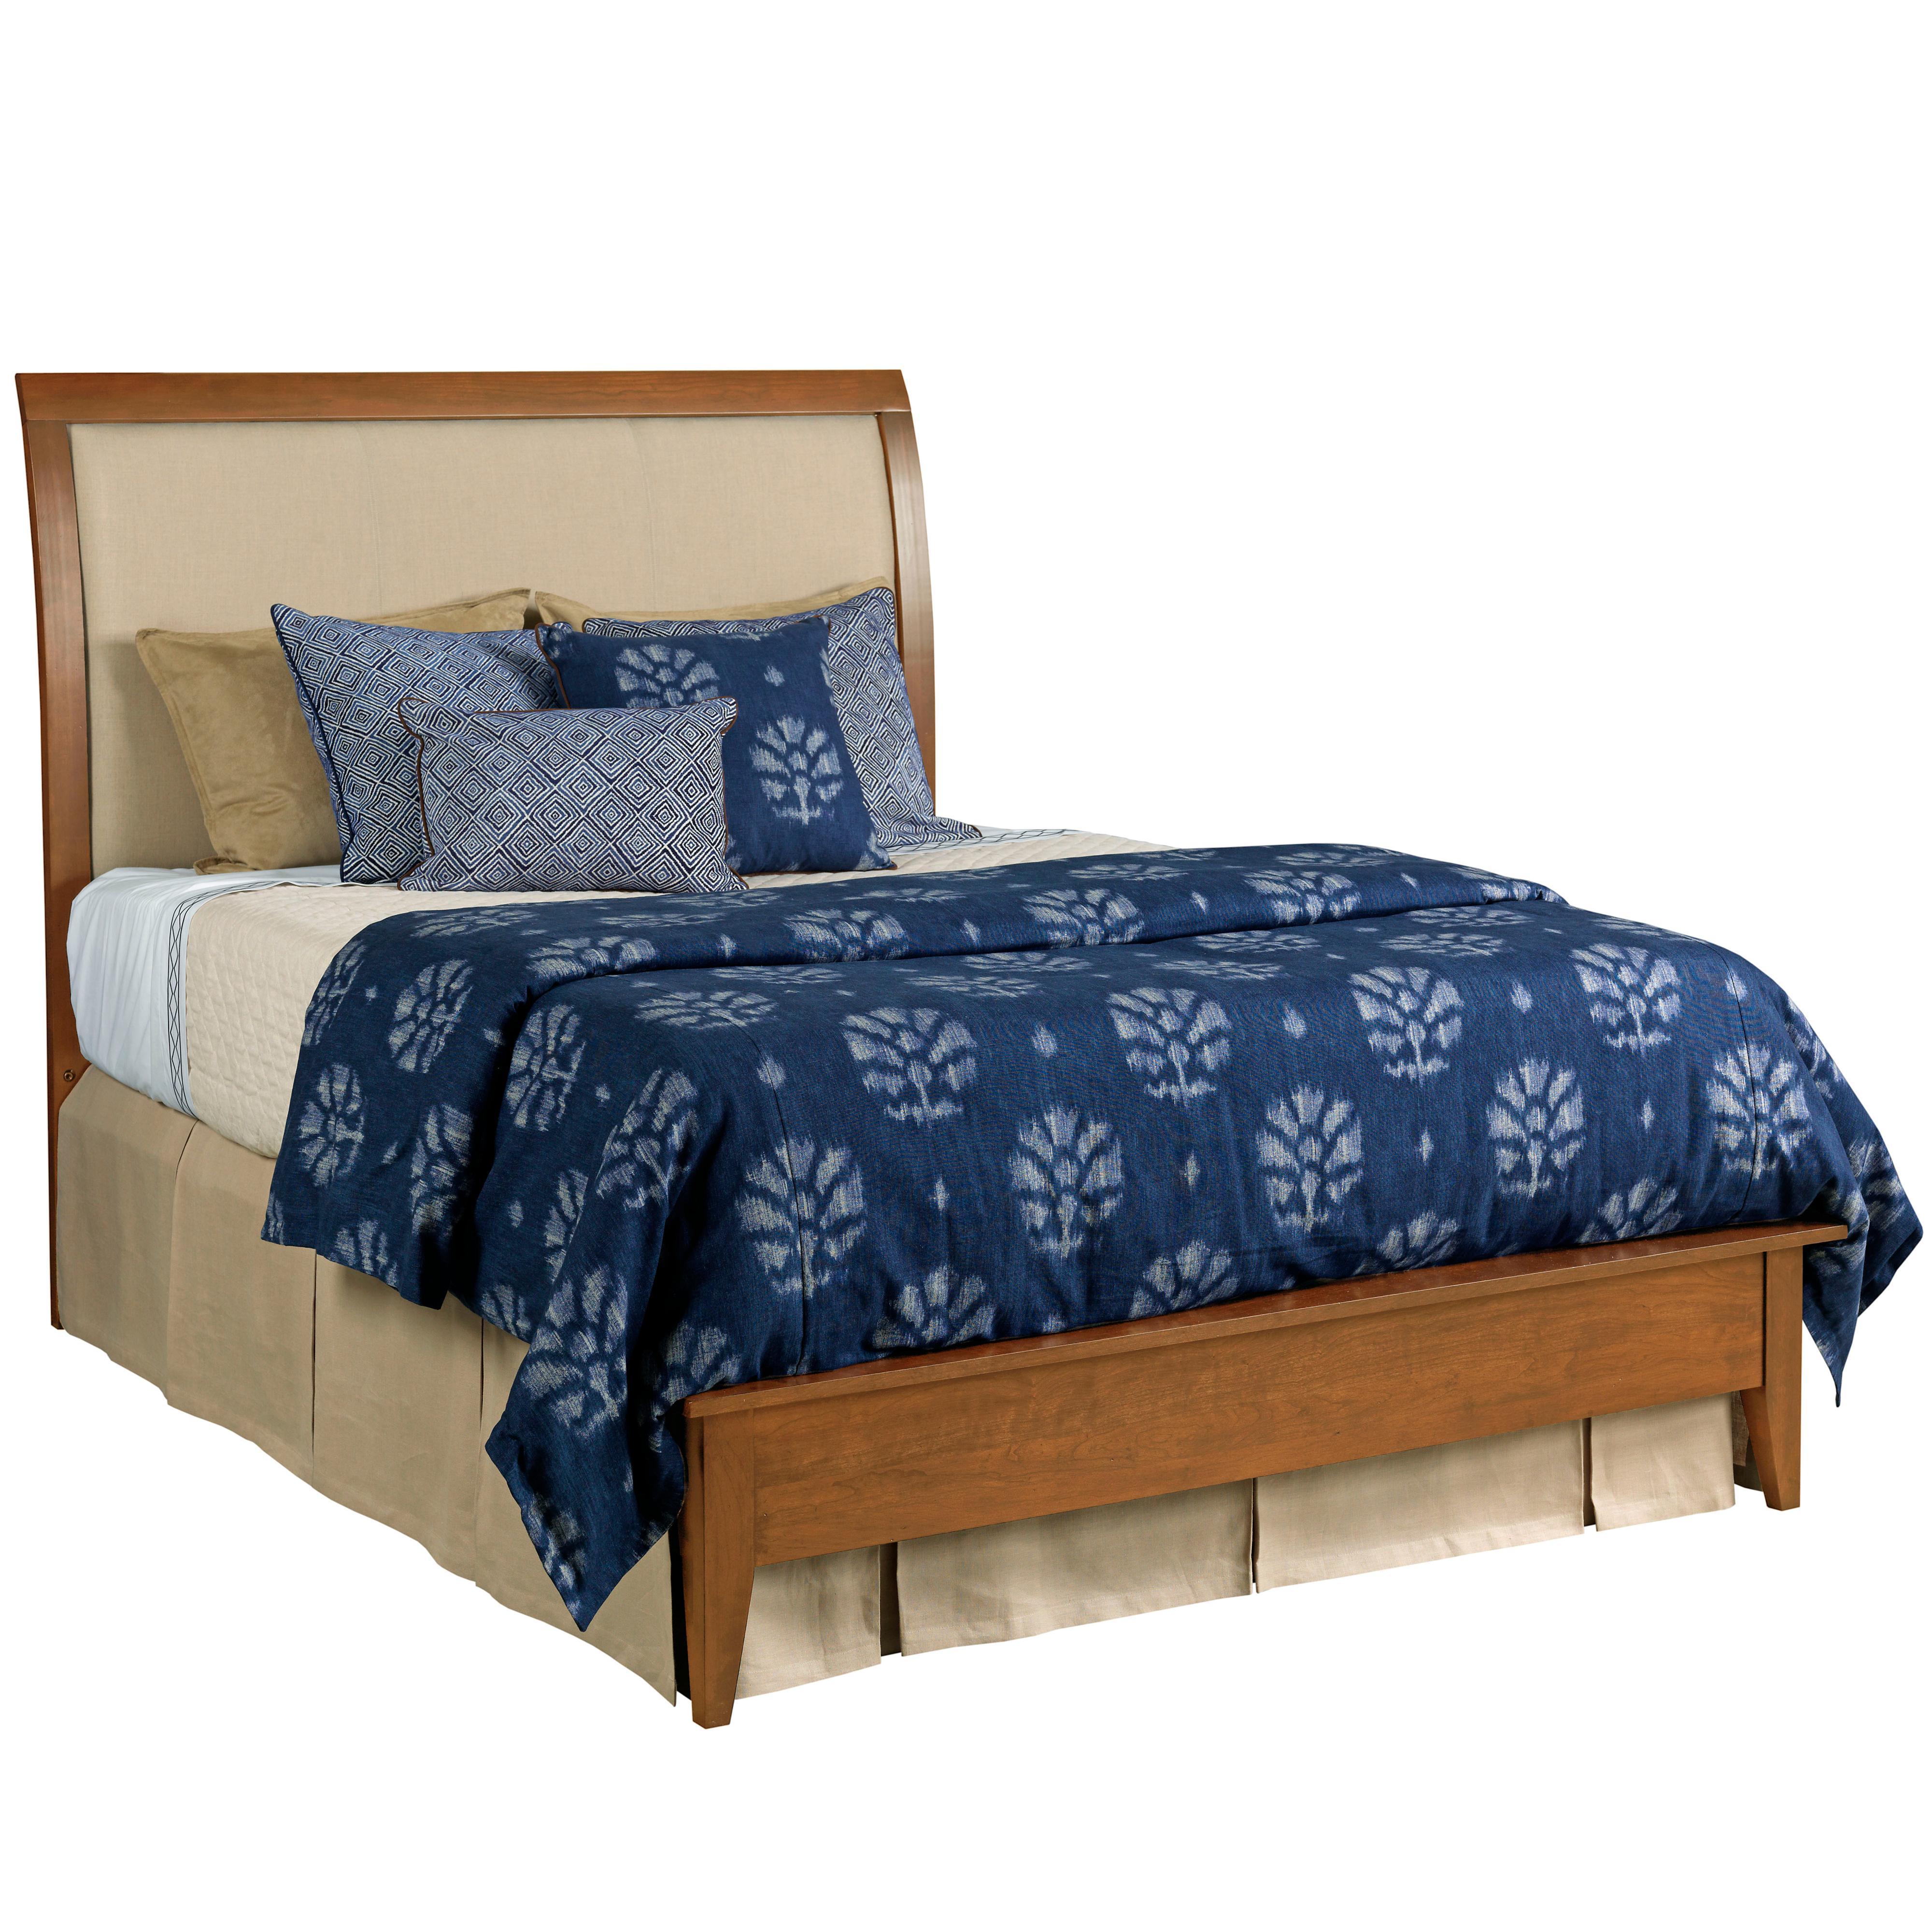 Kincaid Furniture Gatherings King Meridian Bed - Item Number: 44-2610